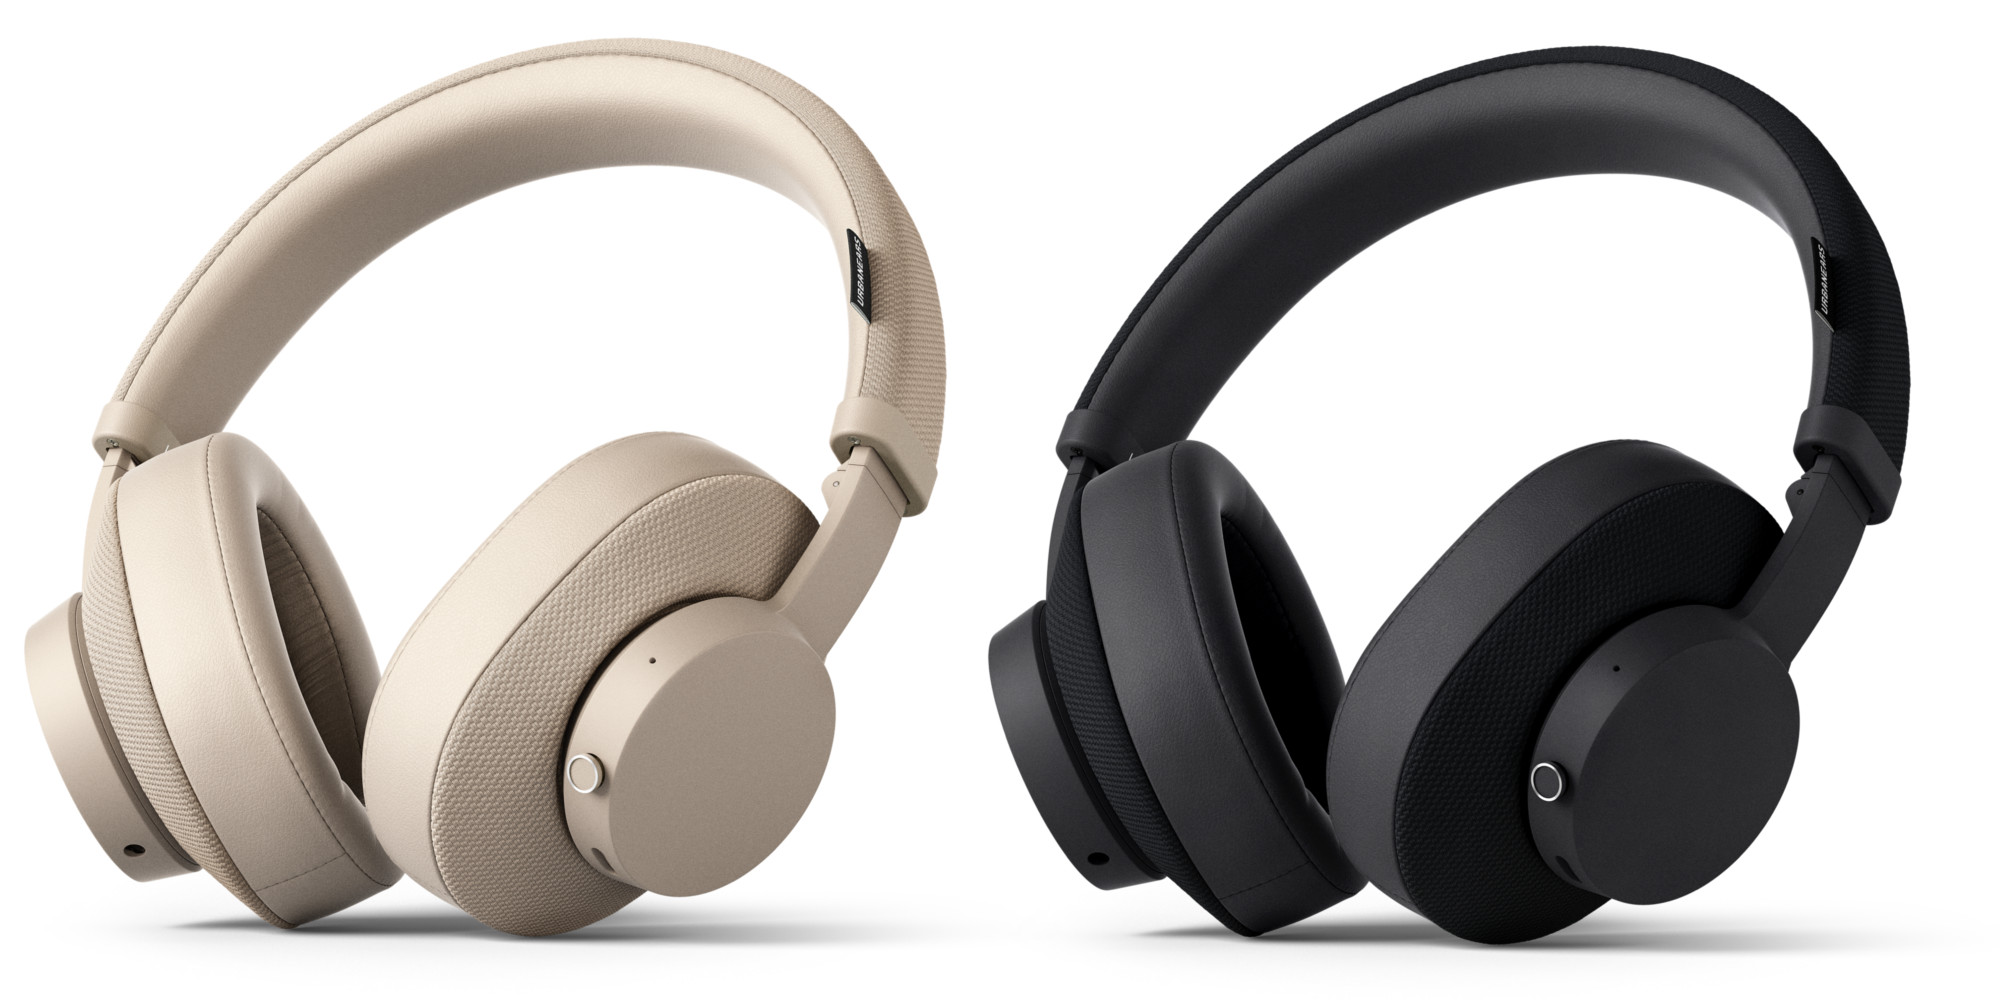 Urbanears Pampas headphones with music sharing